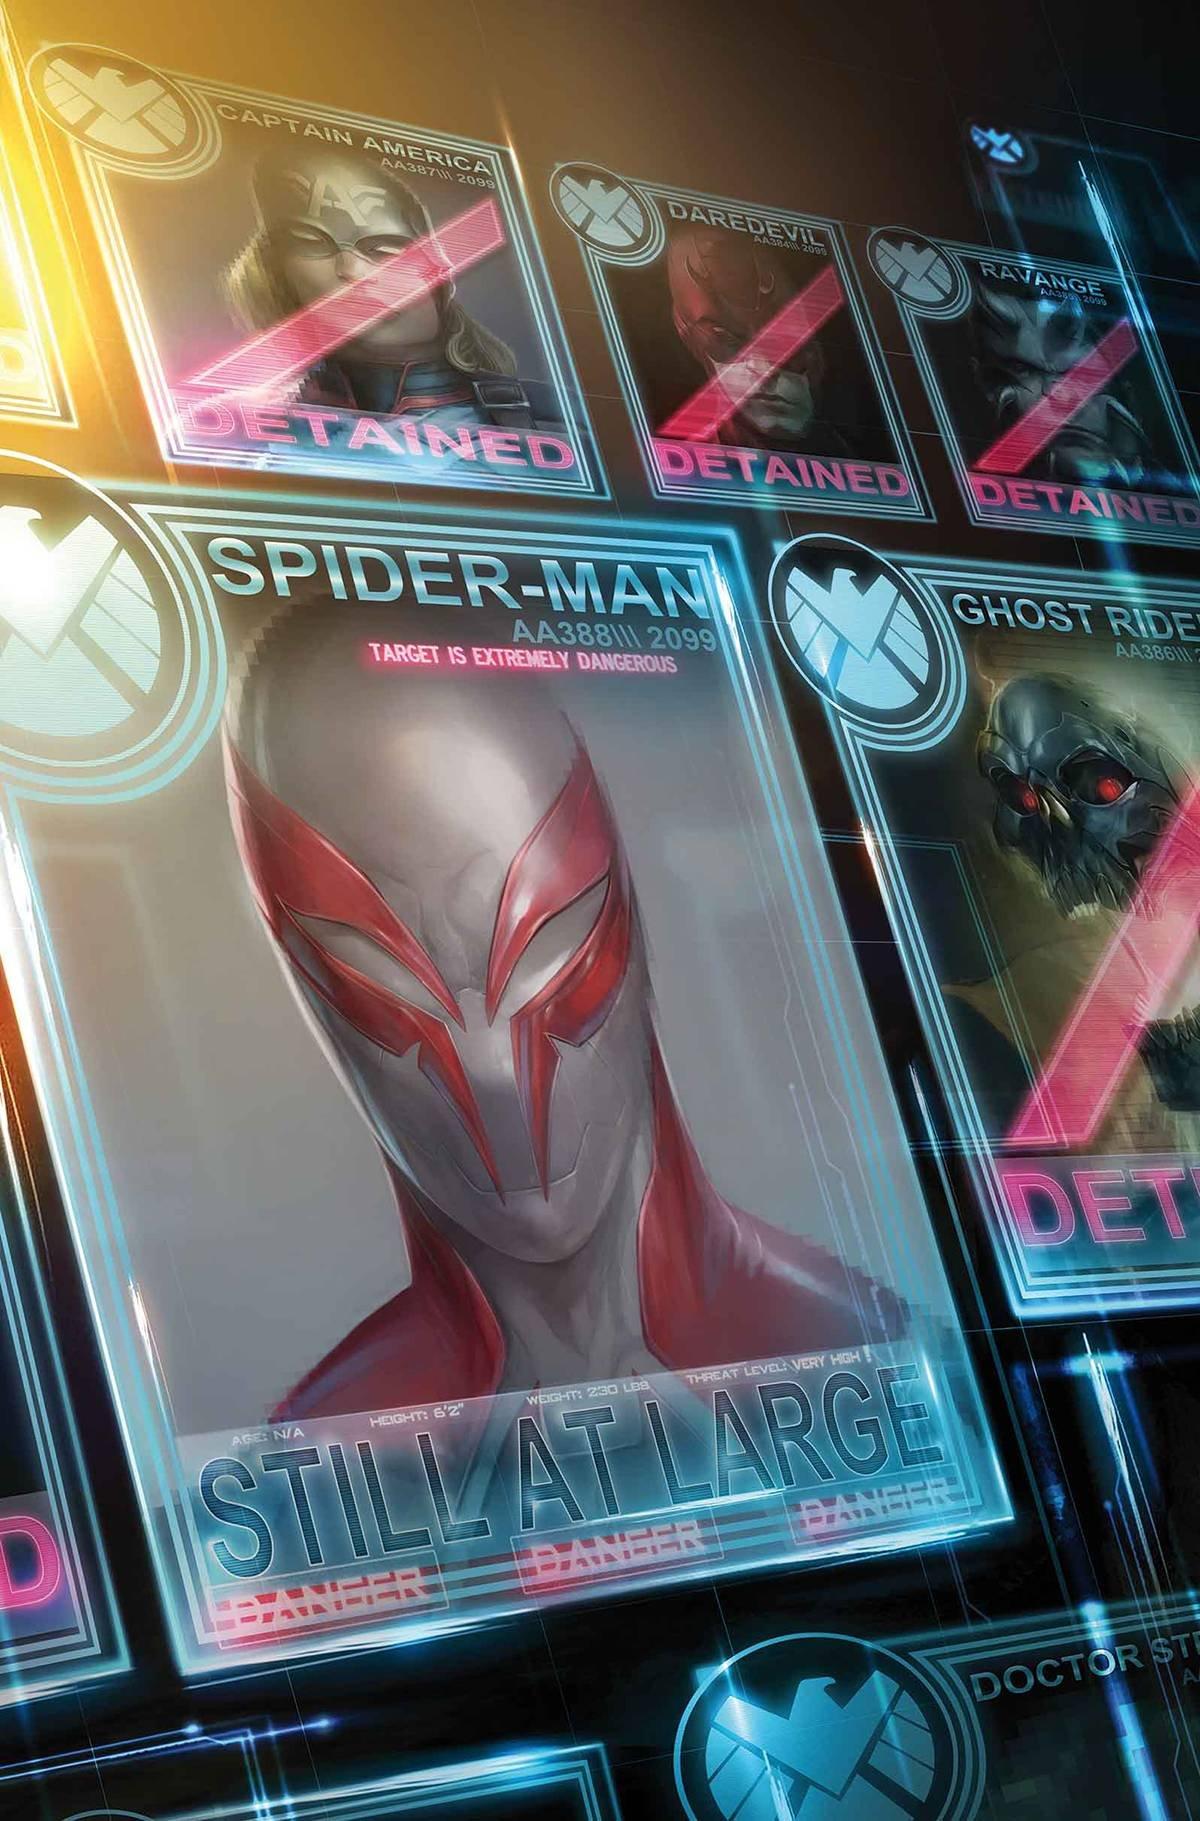 SPIDER-MAN 2099 #15 VOL 3 COVER A CIVIL WAR II PDF